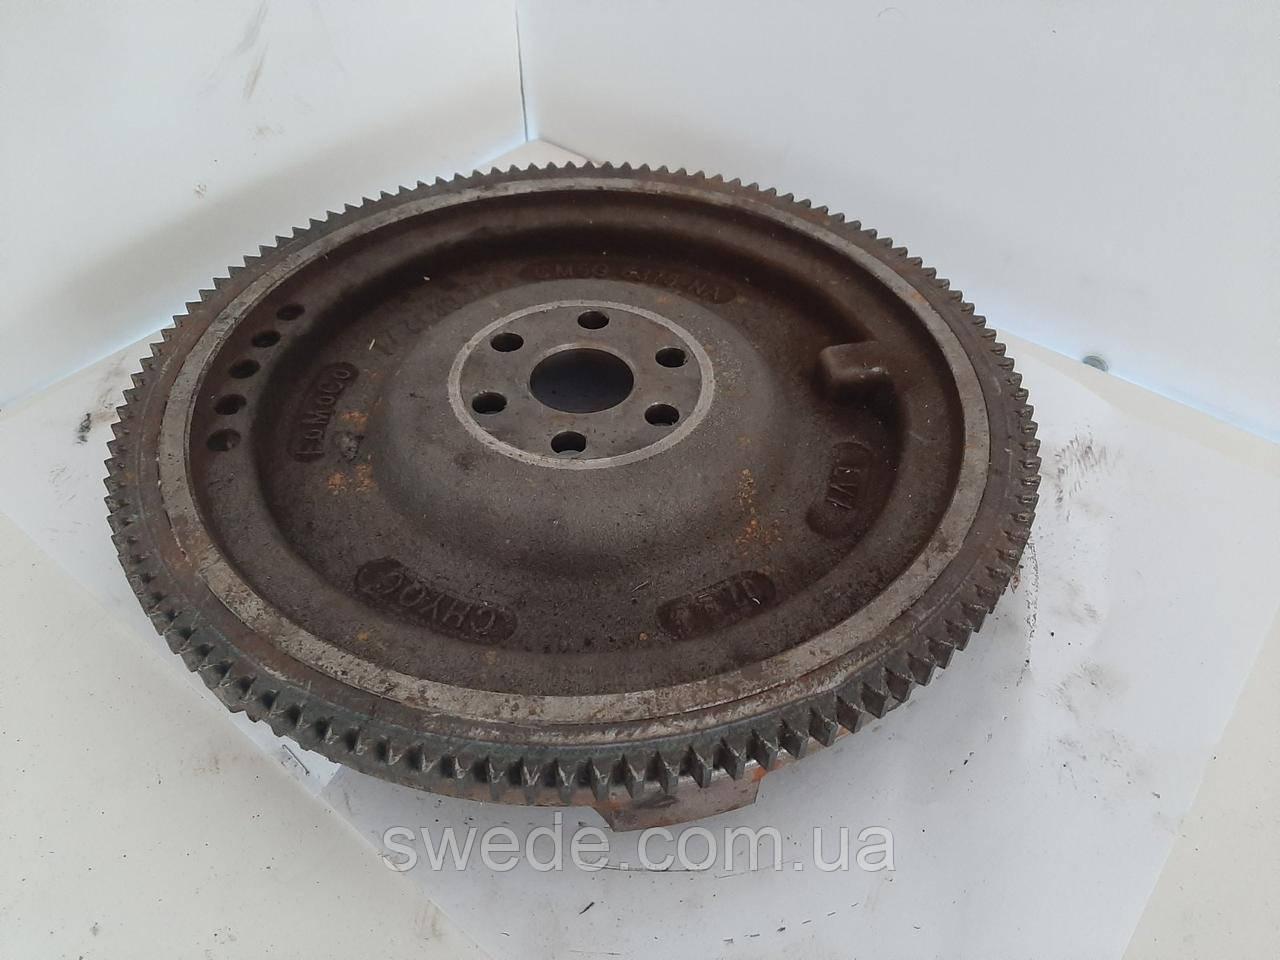 Маховик двигателя Ford Fiesta 1.0 12V EcoBoost 2008-2014 гг CM5G6375NA